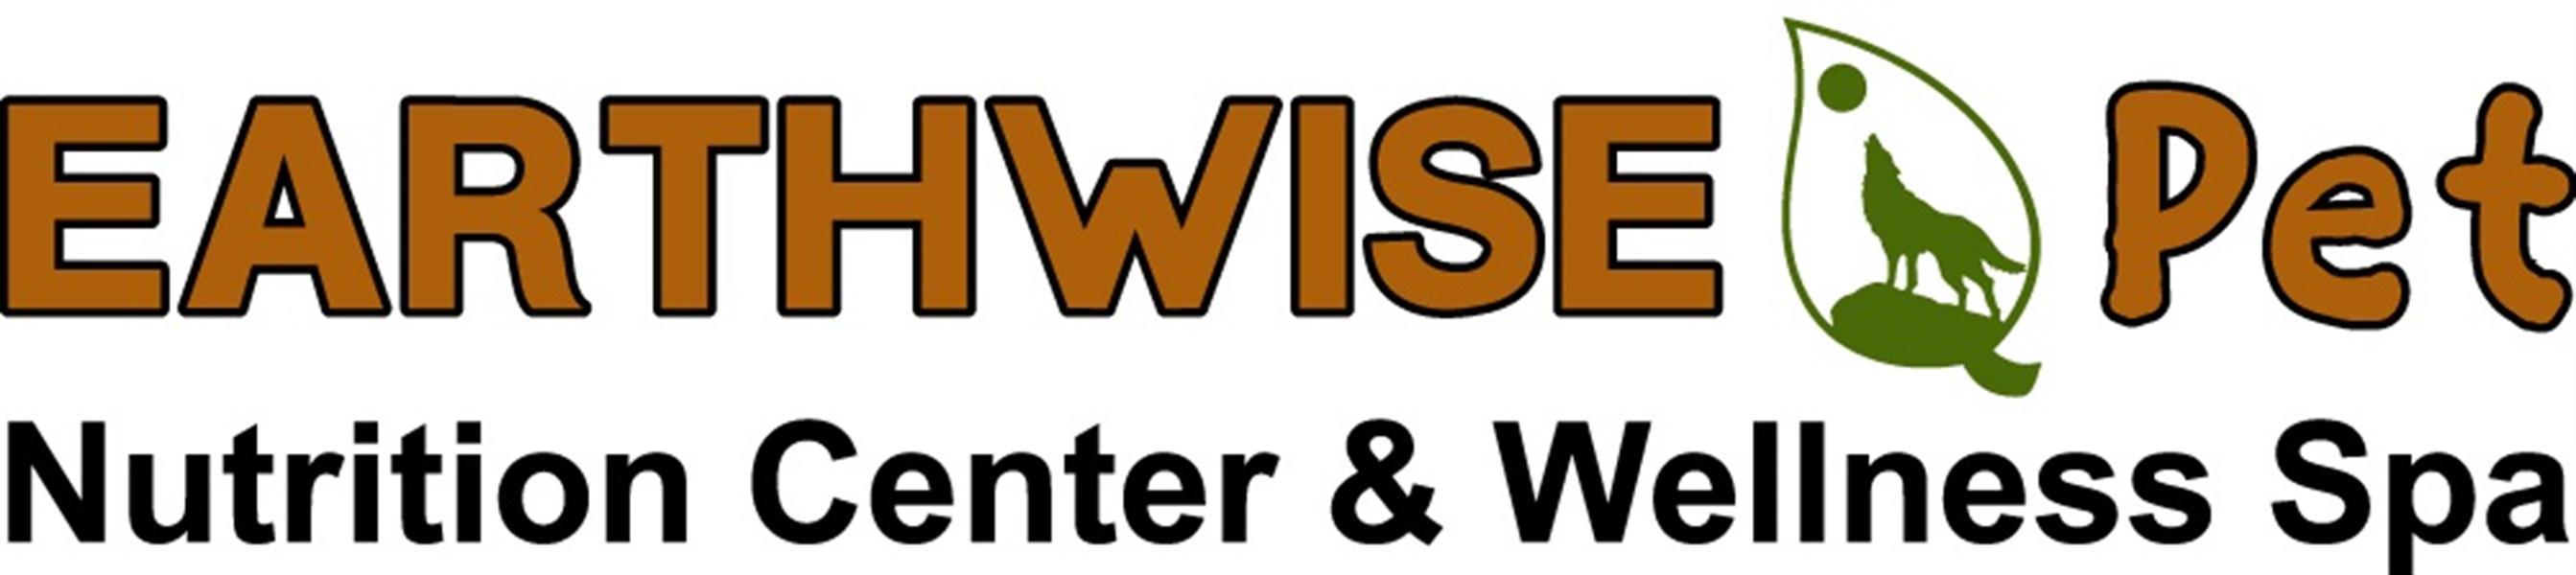 Furry Kidz Spa & Supplies Inc, DBA EarthWise Pet